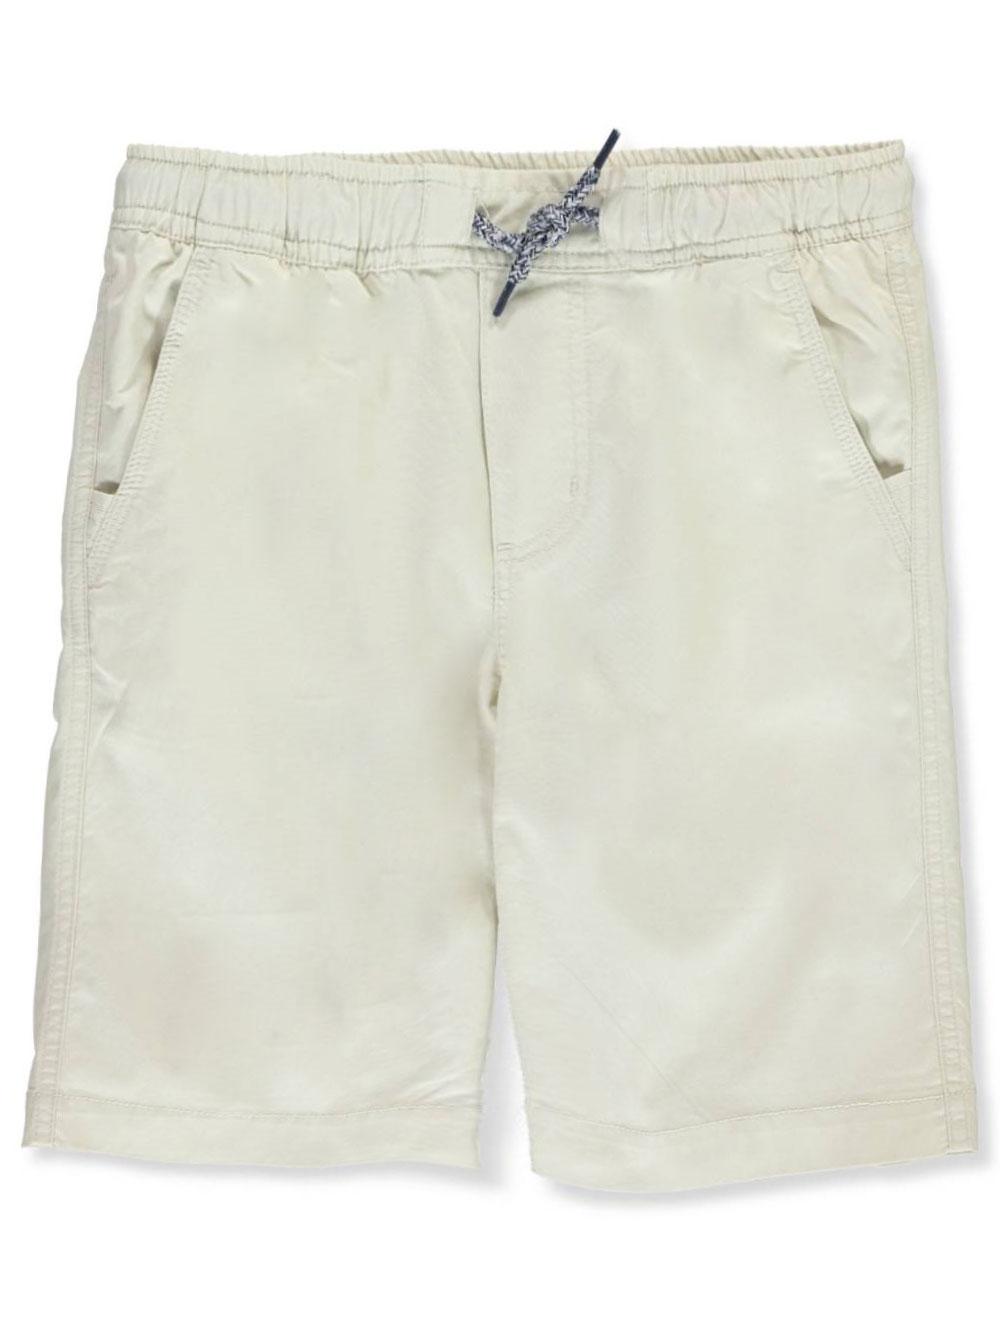 Nautica Boys Twill Shorts